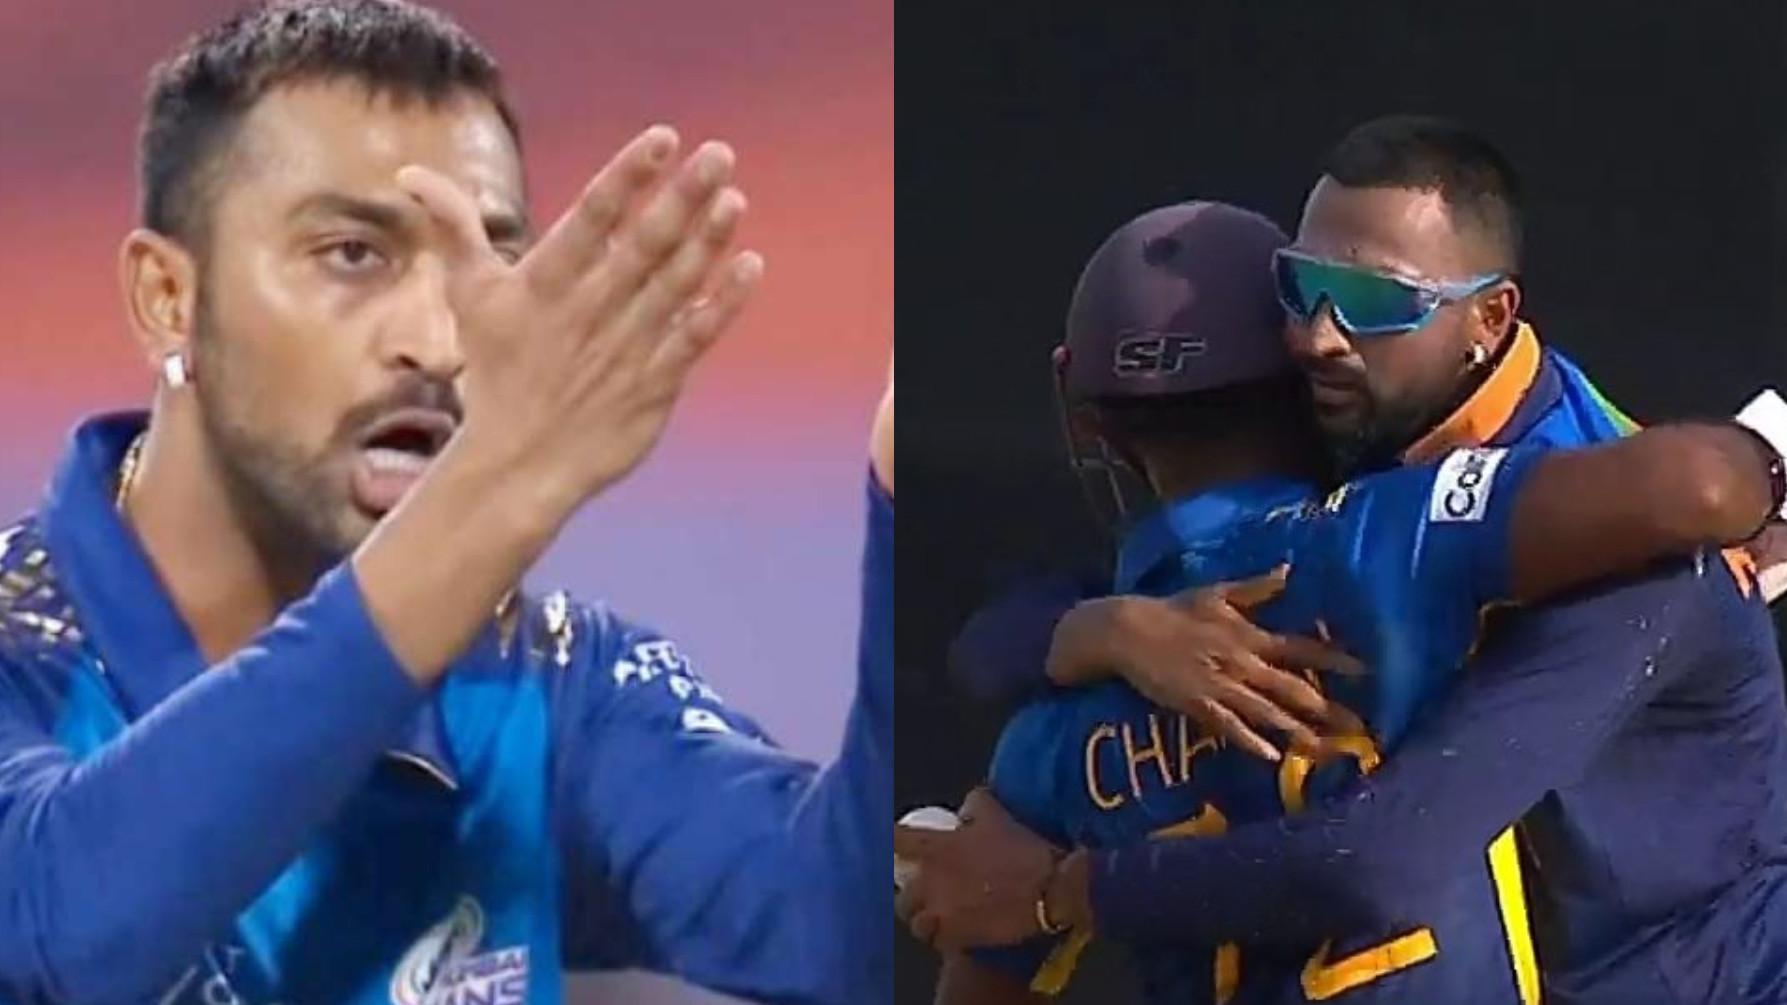 SL v IND 2021: Cricket fans react hilariously to Krunal Pandya hugging Charith Asalanka